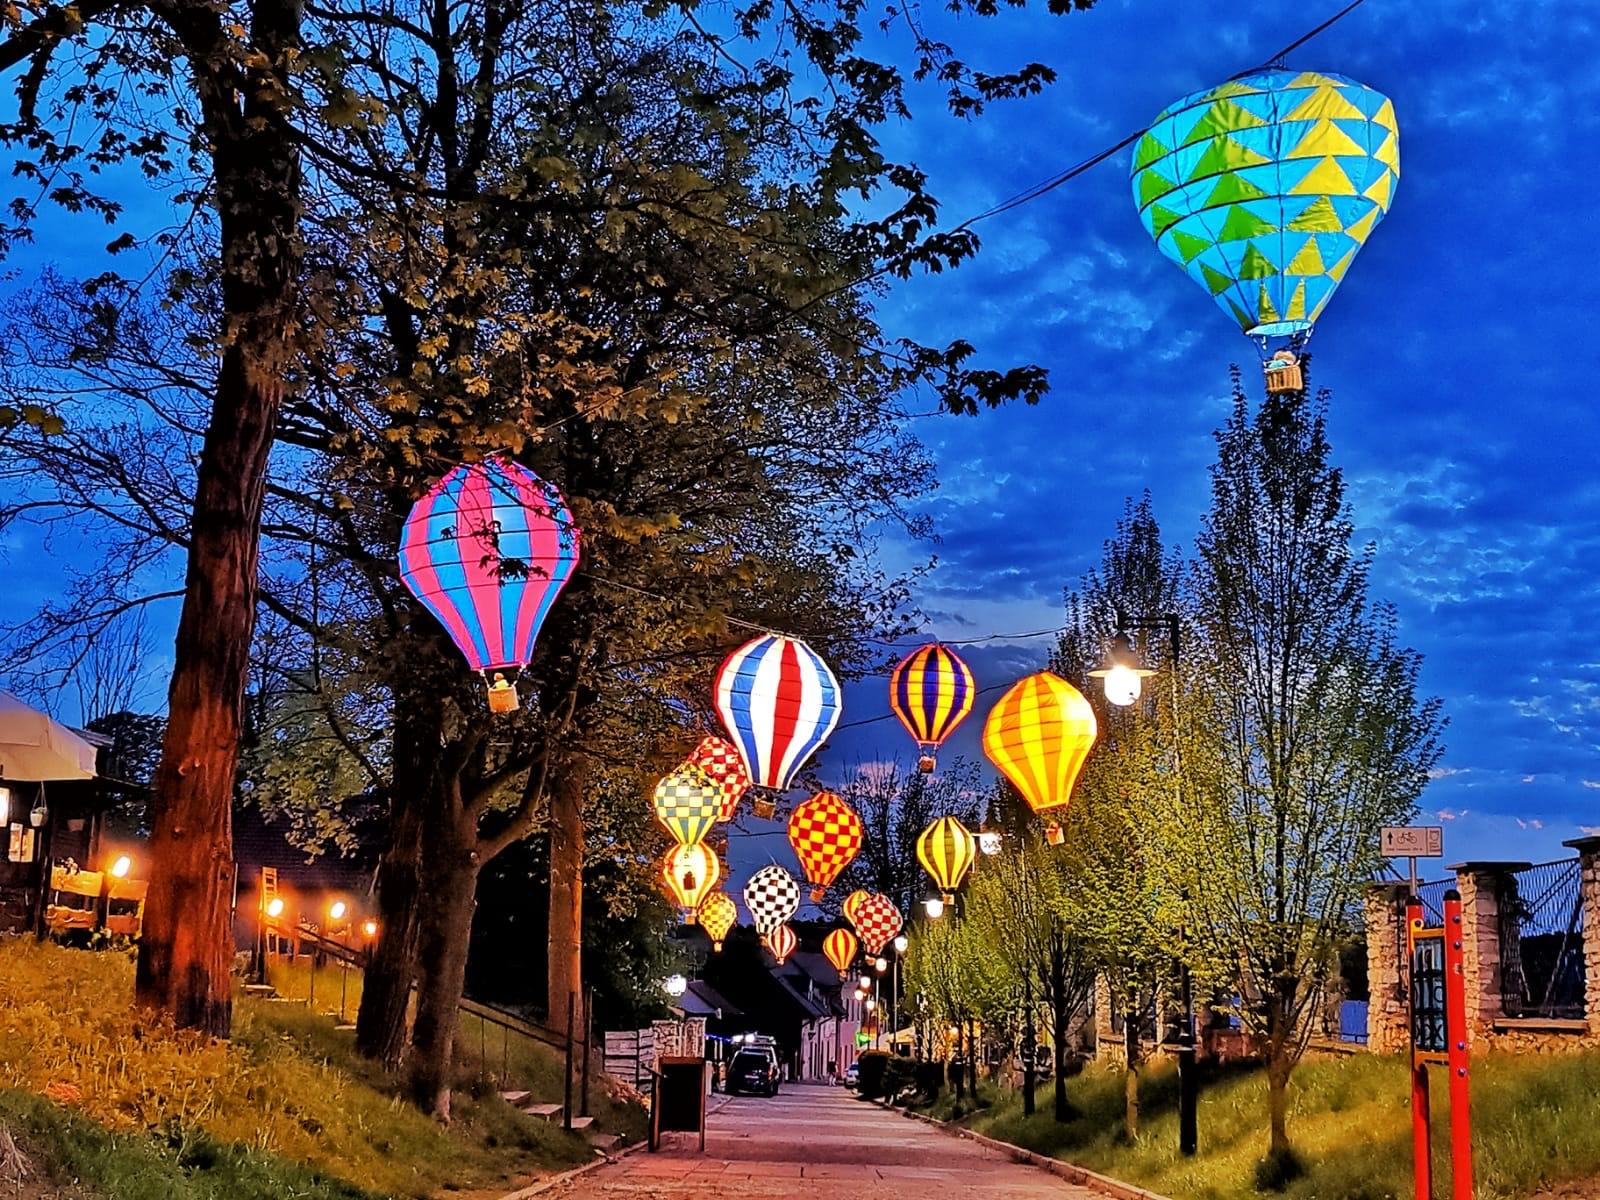 instalacja balonowa